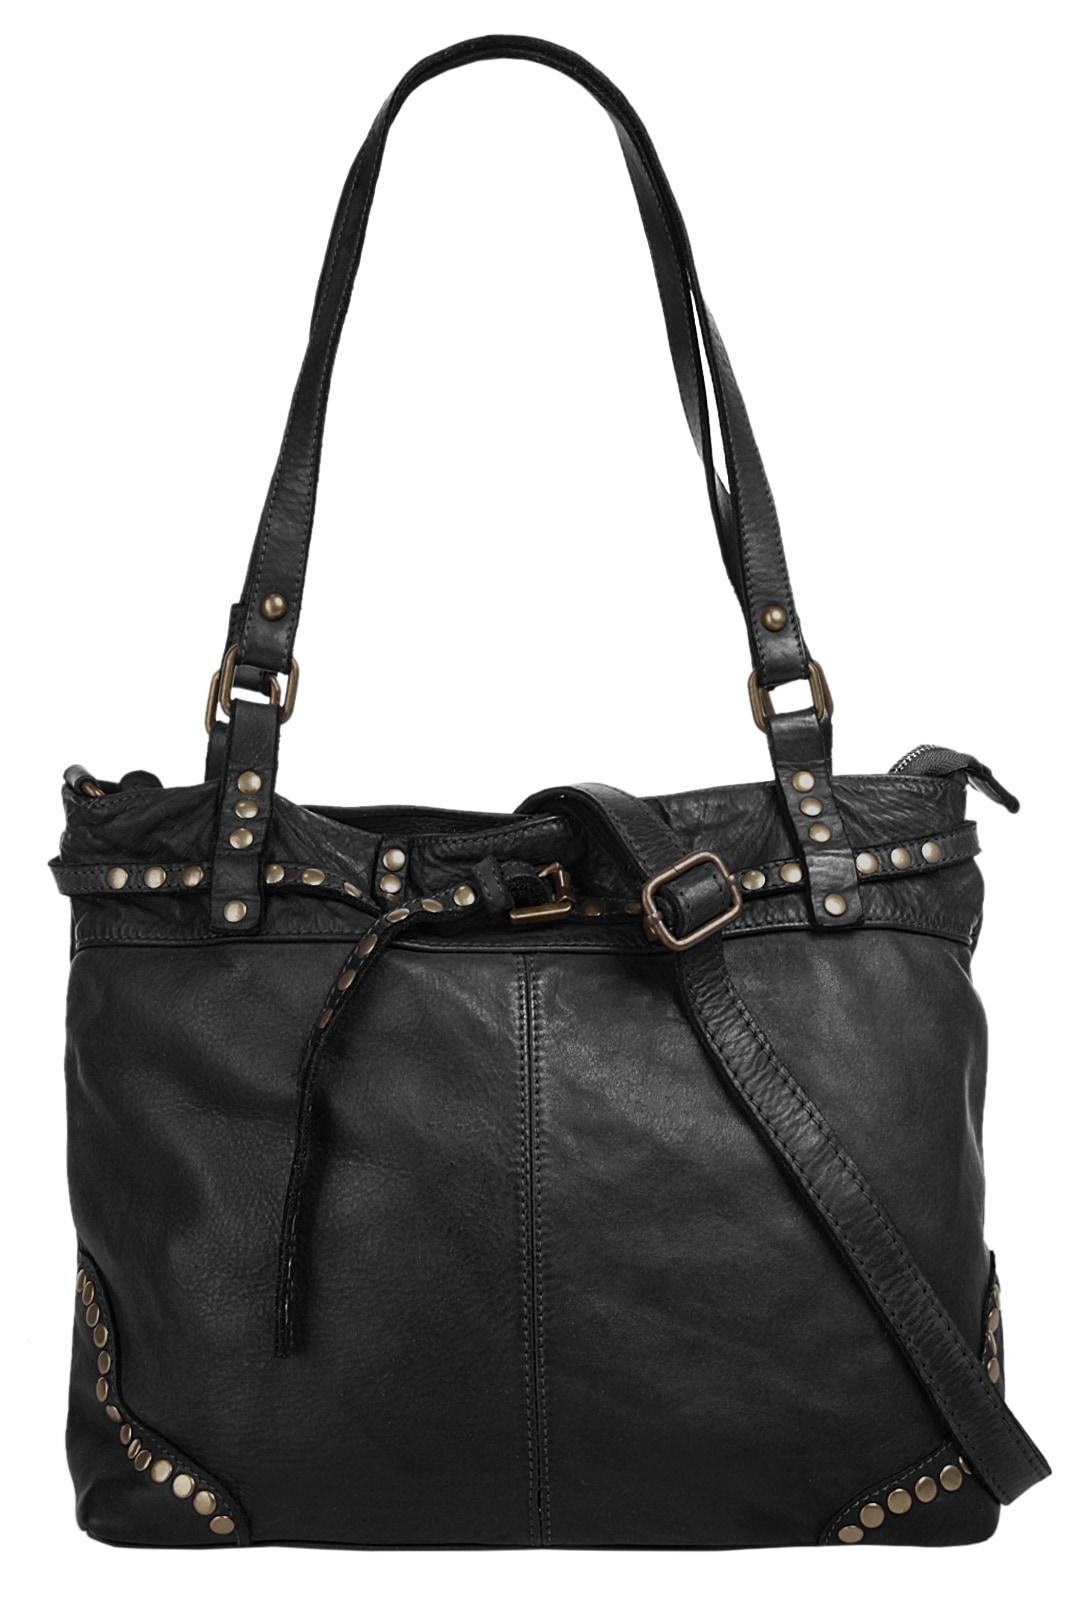 Samantha Look Shopper | Taschen > Handtaschen > Shopper | Samantha Look